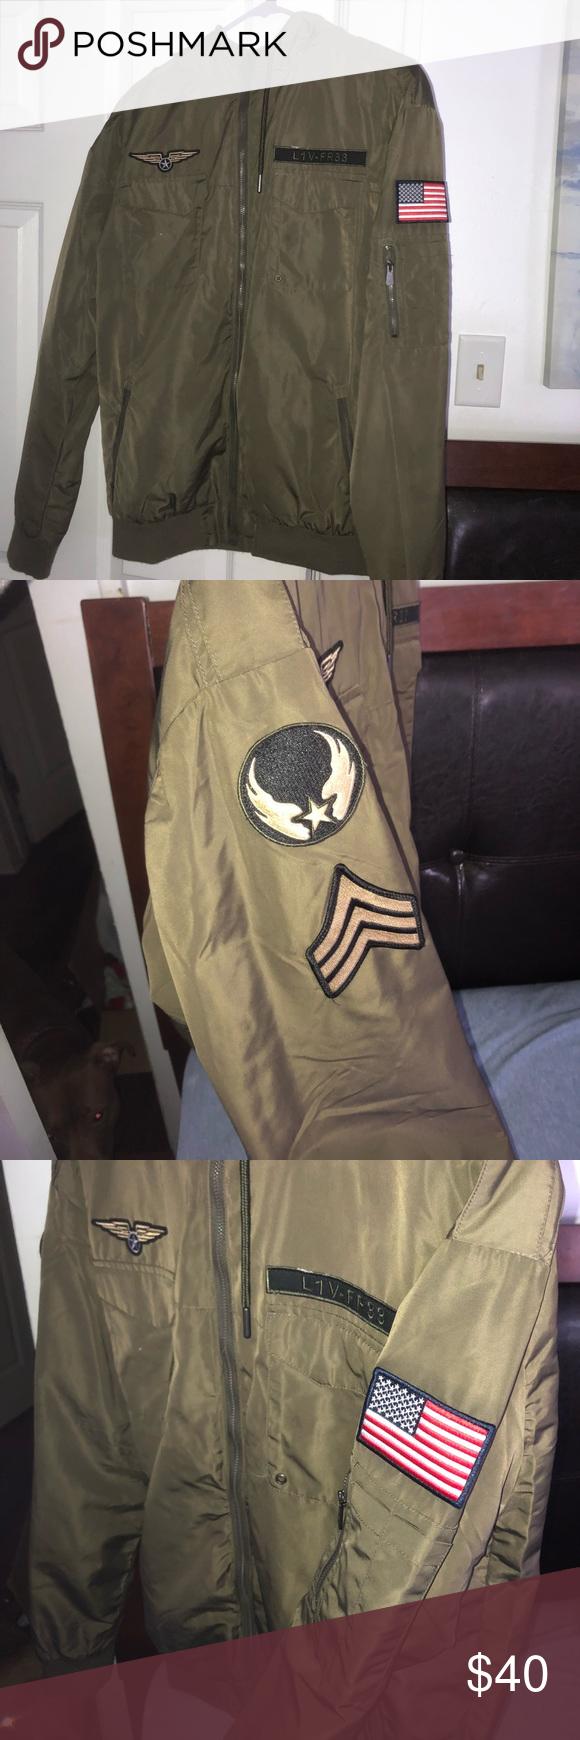 Bomber Jacket Army Green Bomber Jacket Jackets Bomber Jacket [ 1740 x 580 Pixel ]